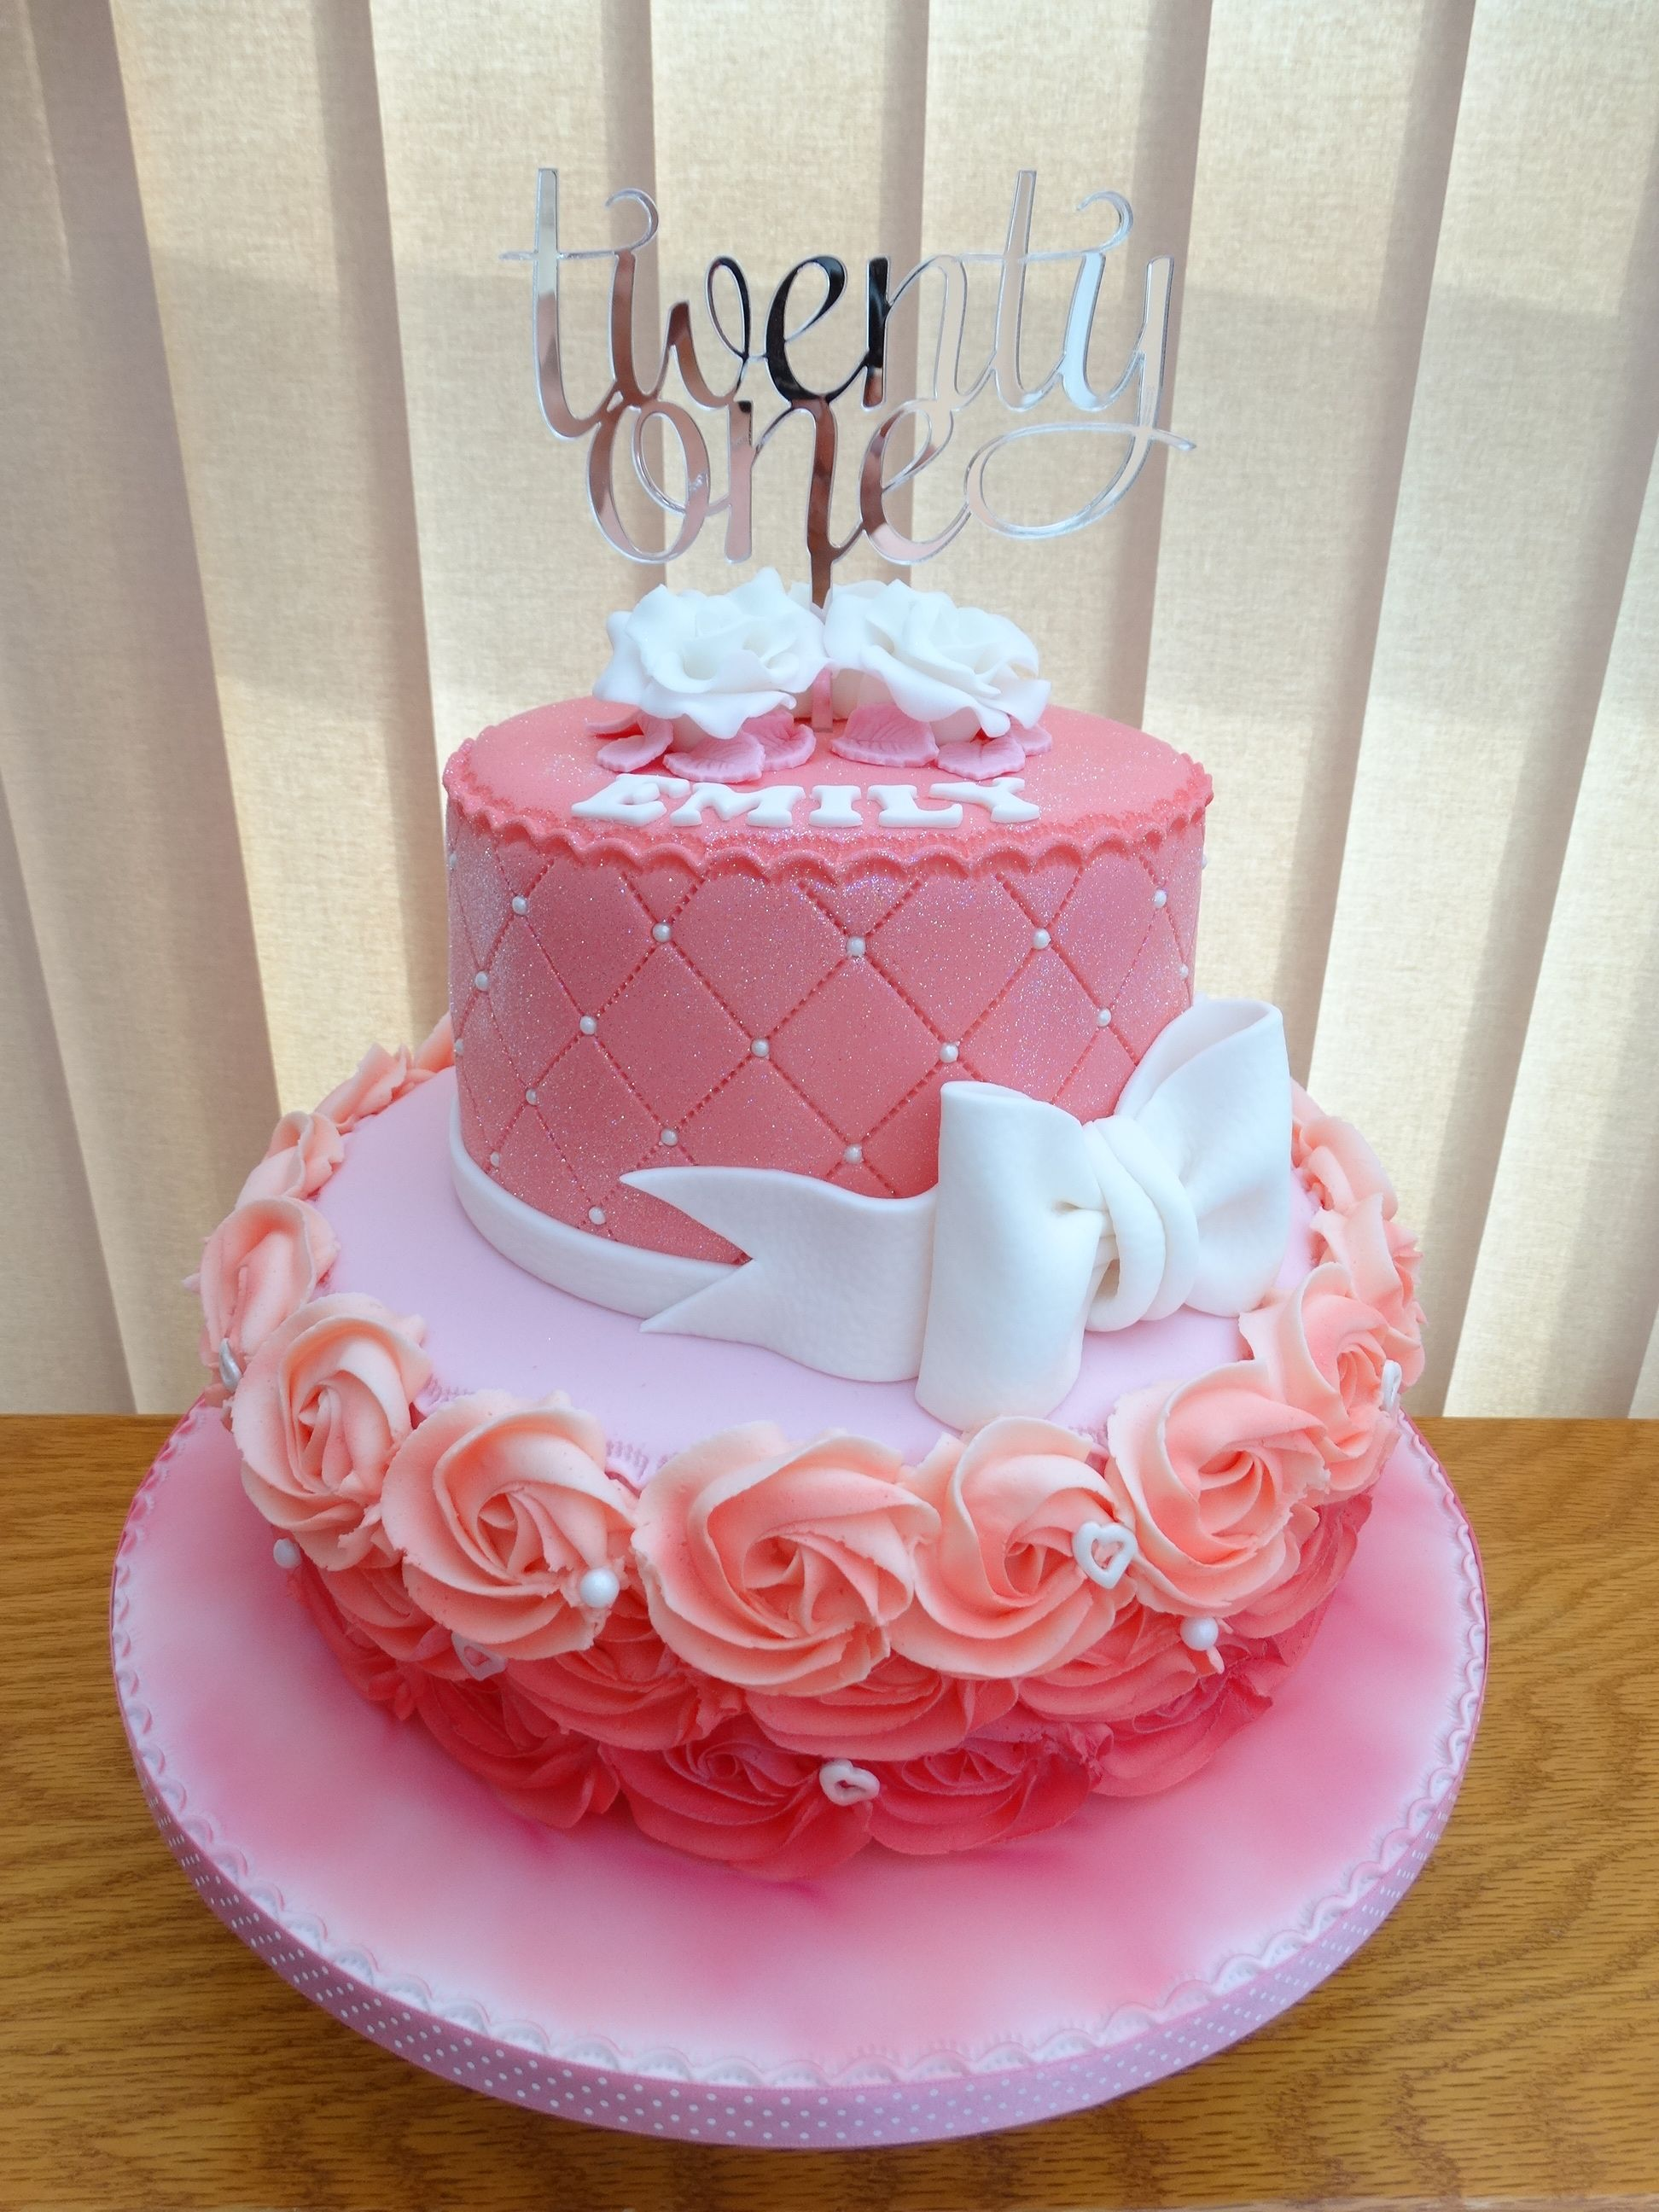 21st Pink Sparkle Cake XMCx Sparkles Birthday Cakes Anniversary